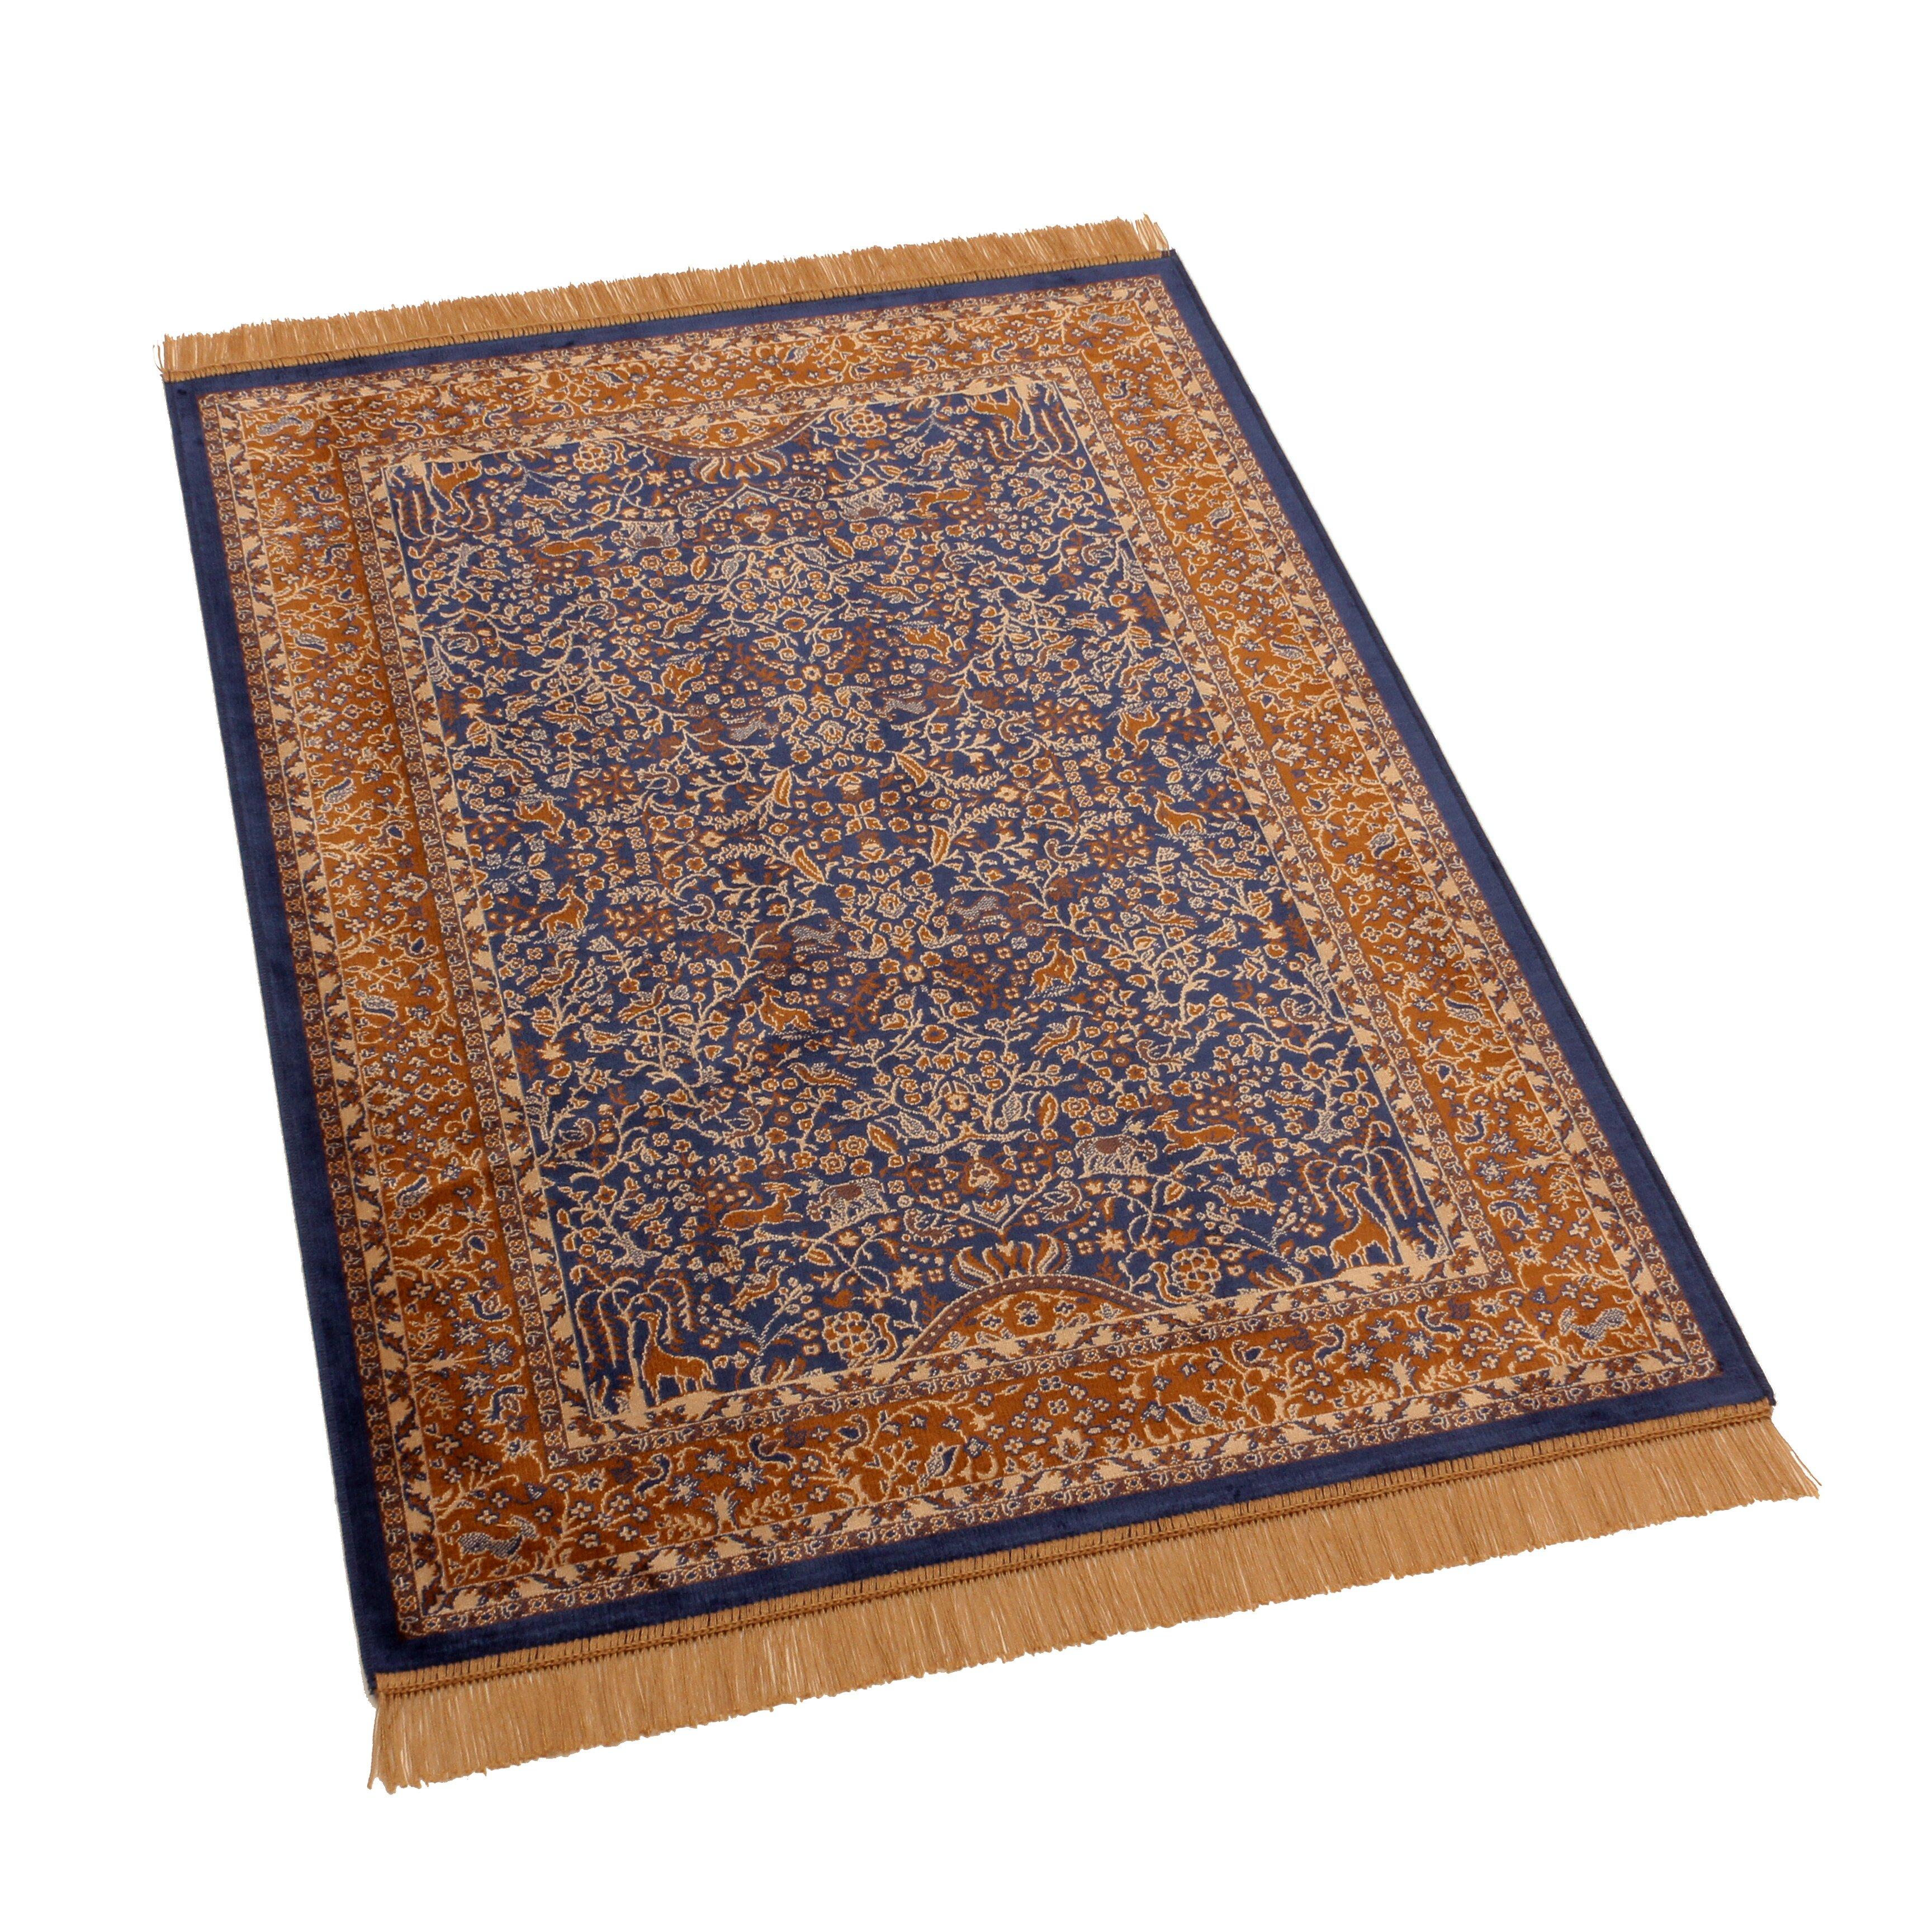 Barefoot artsilk rugs persian tree of life handmade blue for Custom made area rugs